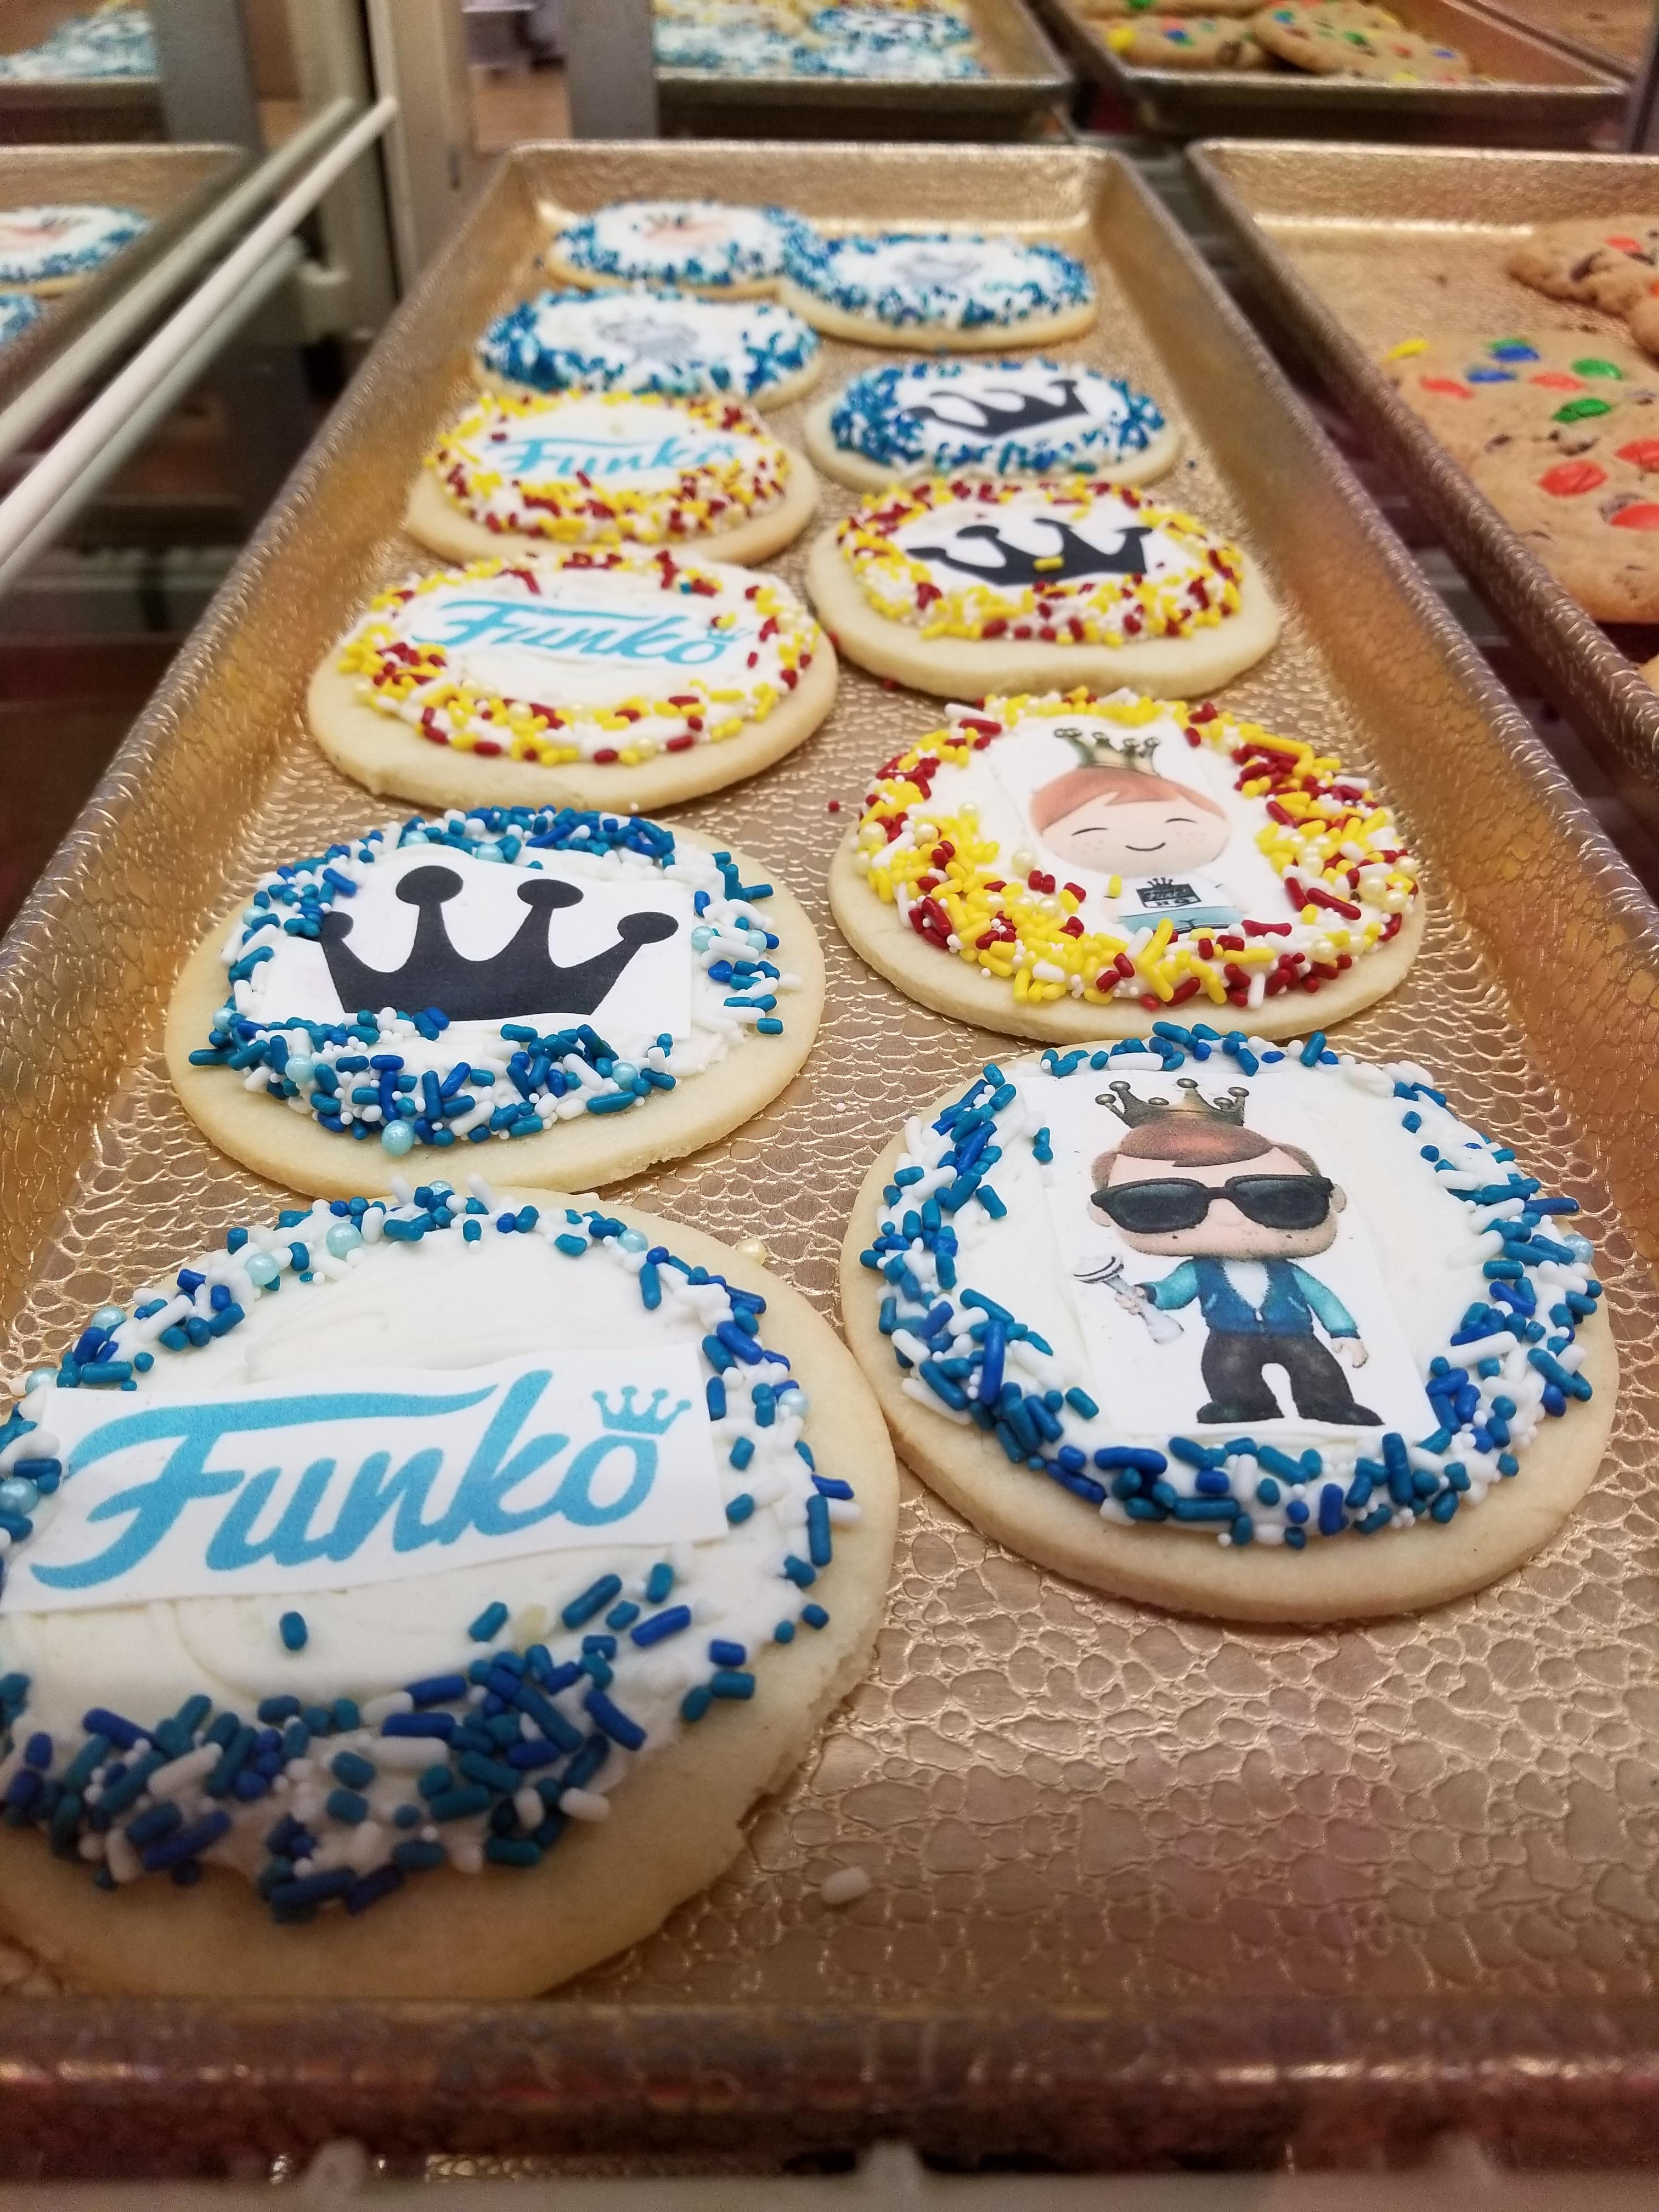 Funko Cookie Display Case (Photo Credit: Jen)